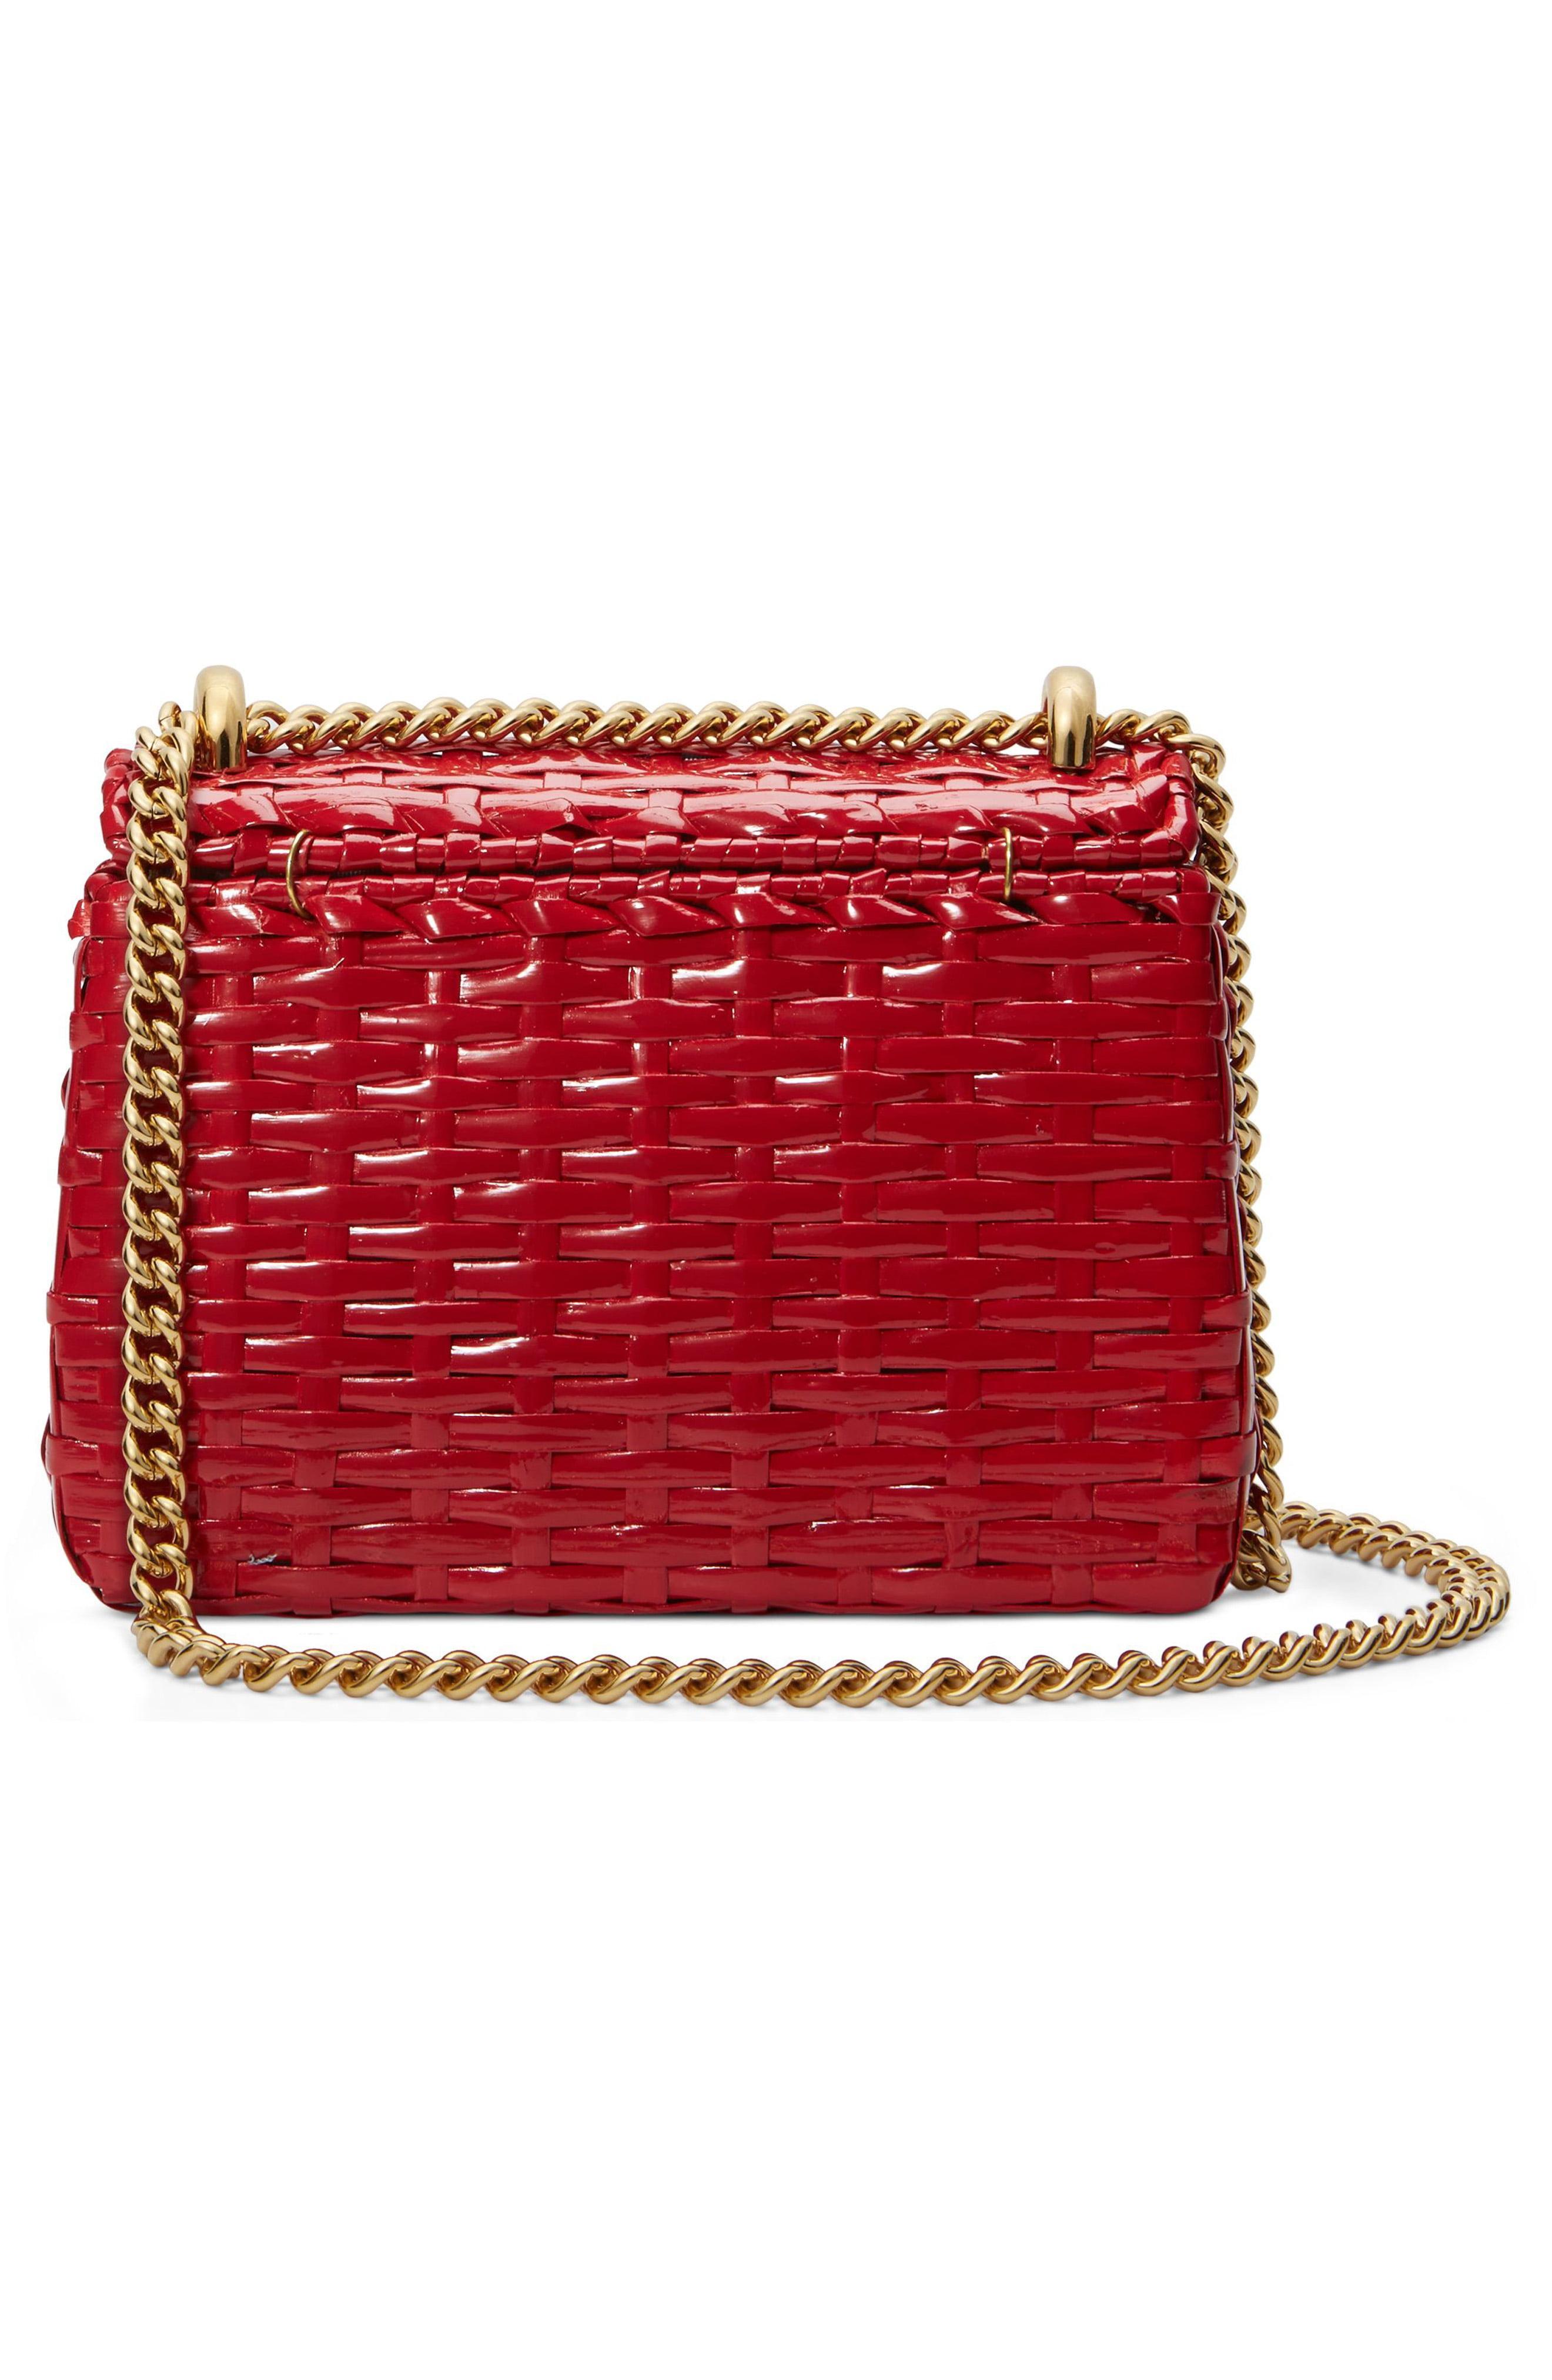 b8d72861eeb Gucci - Red Small Linea Cestino Glazed Wicker Shoulder Bag - Lyst. View  fullscreen